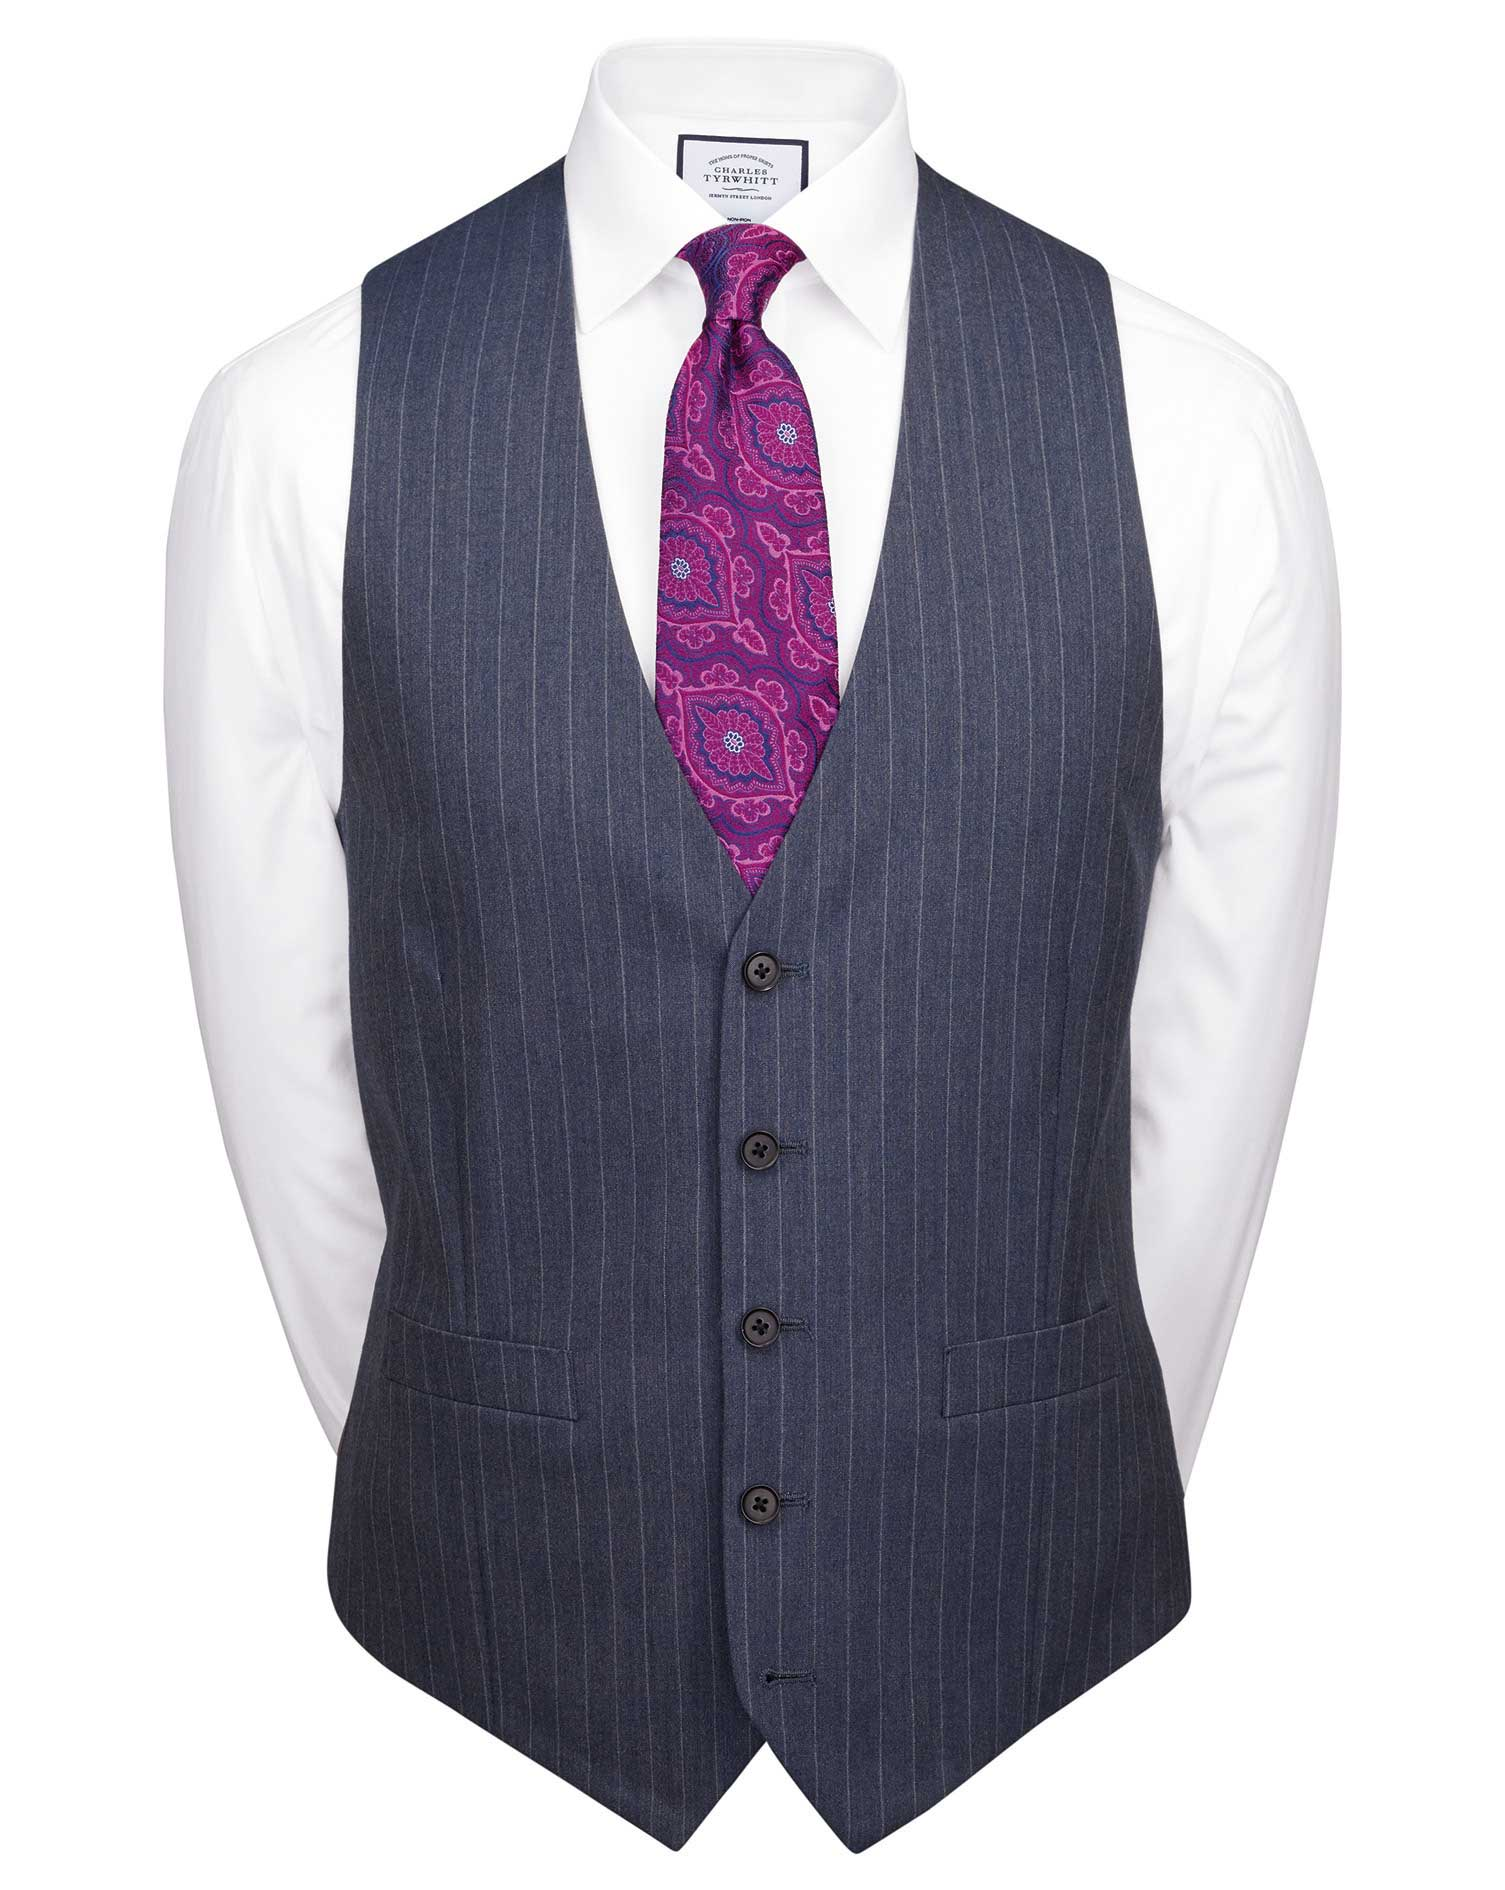 Image of Charles Tyrwhitt Airforce Stripe Slim Fit Panama Business Suit Wool Waistcoat Size w36 by Charles Tyrwhitt